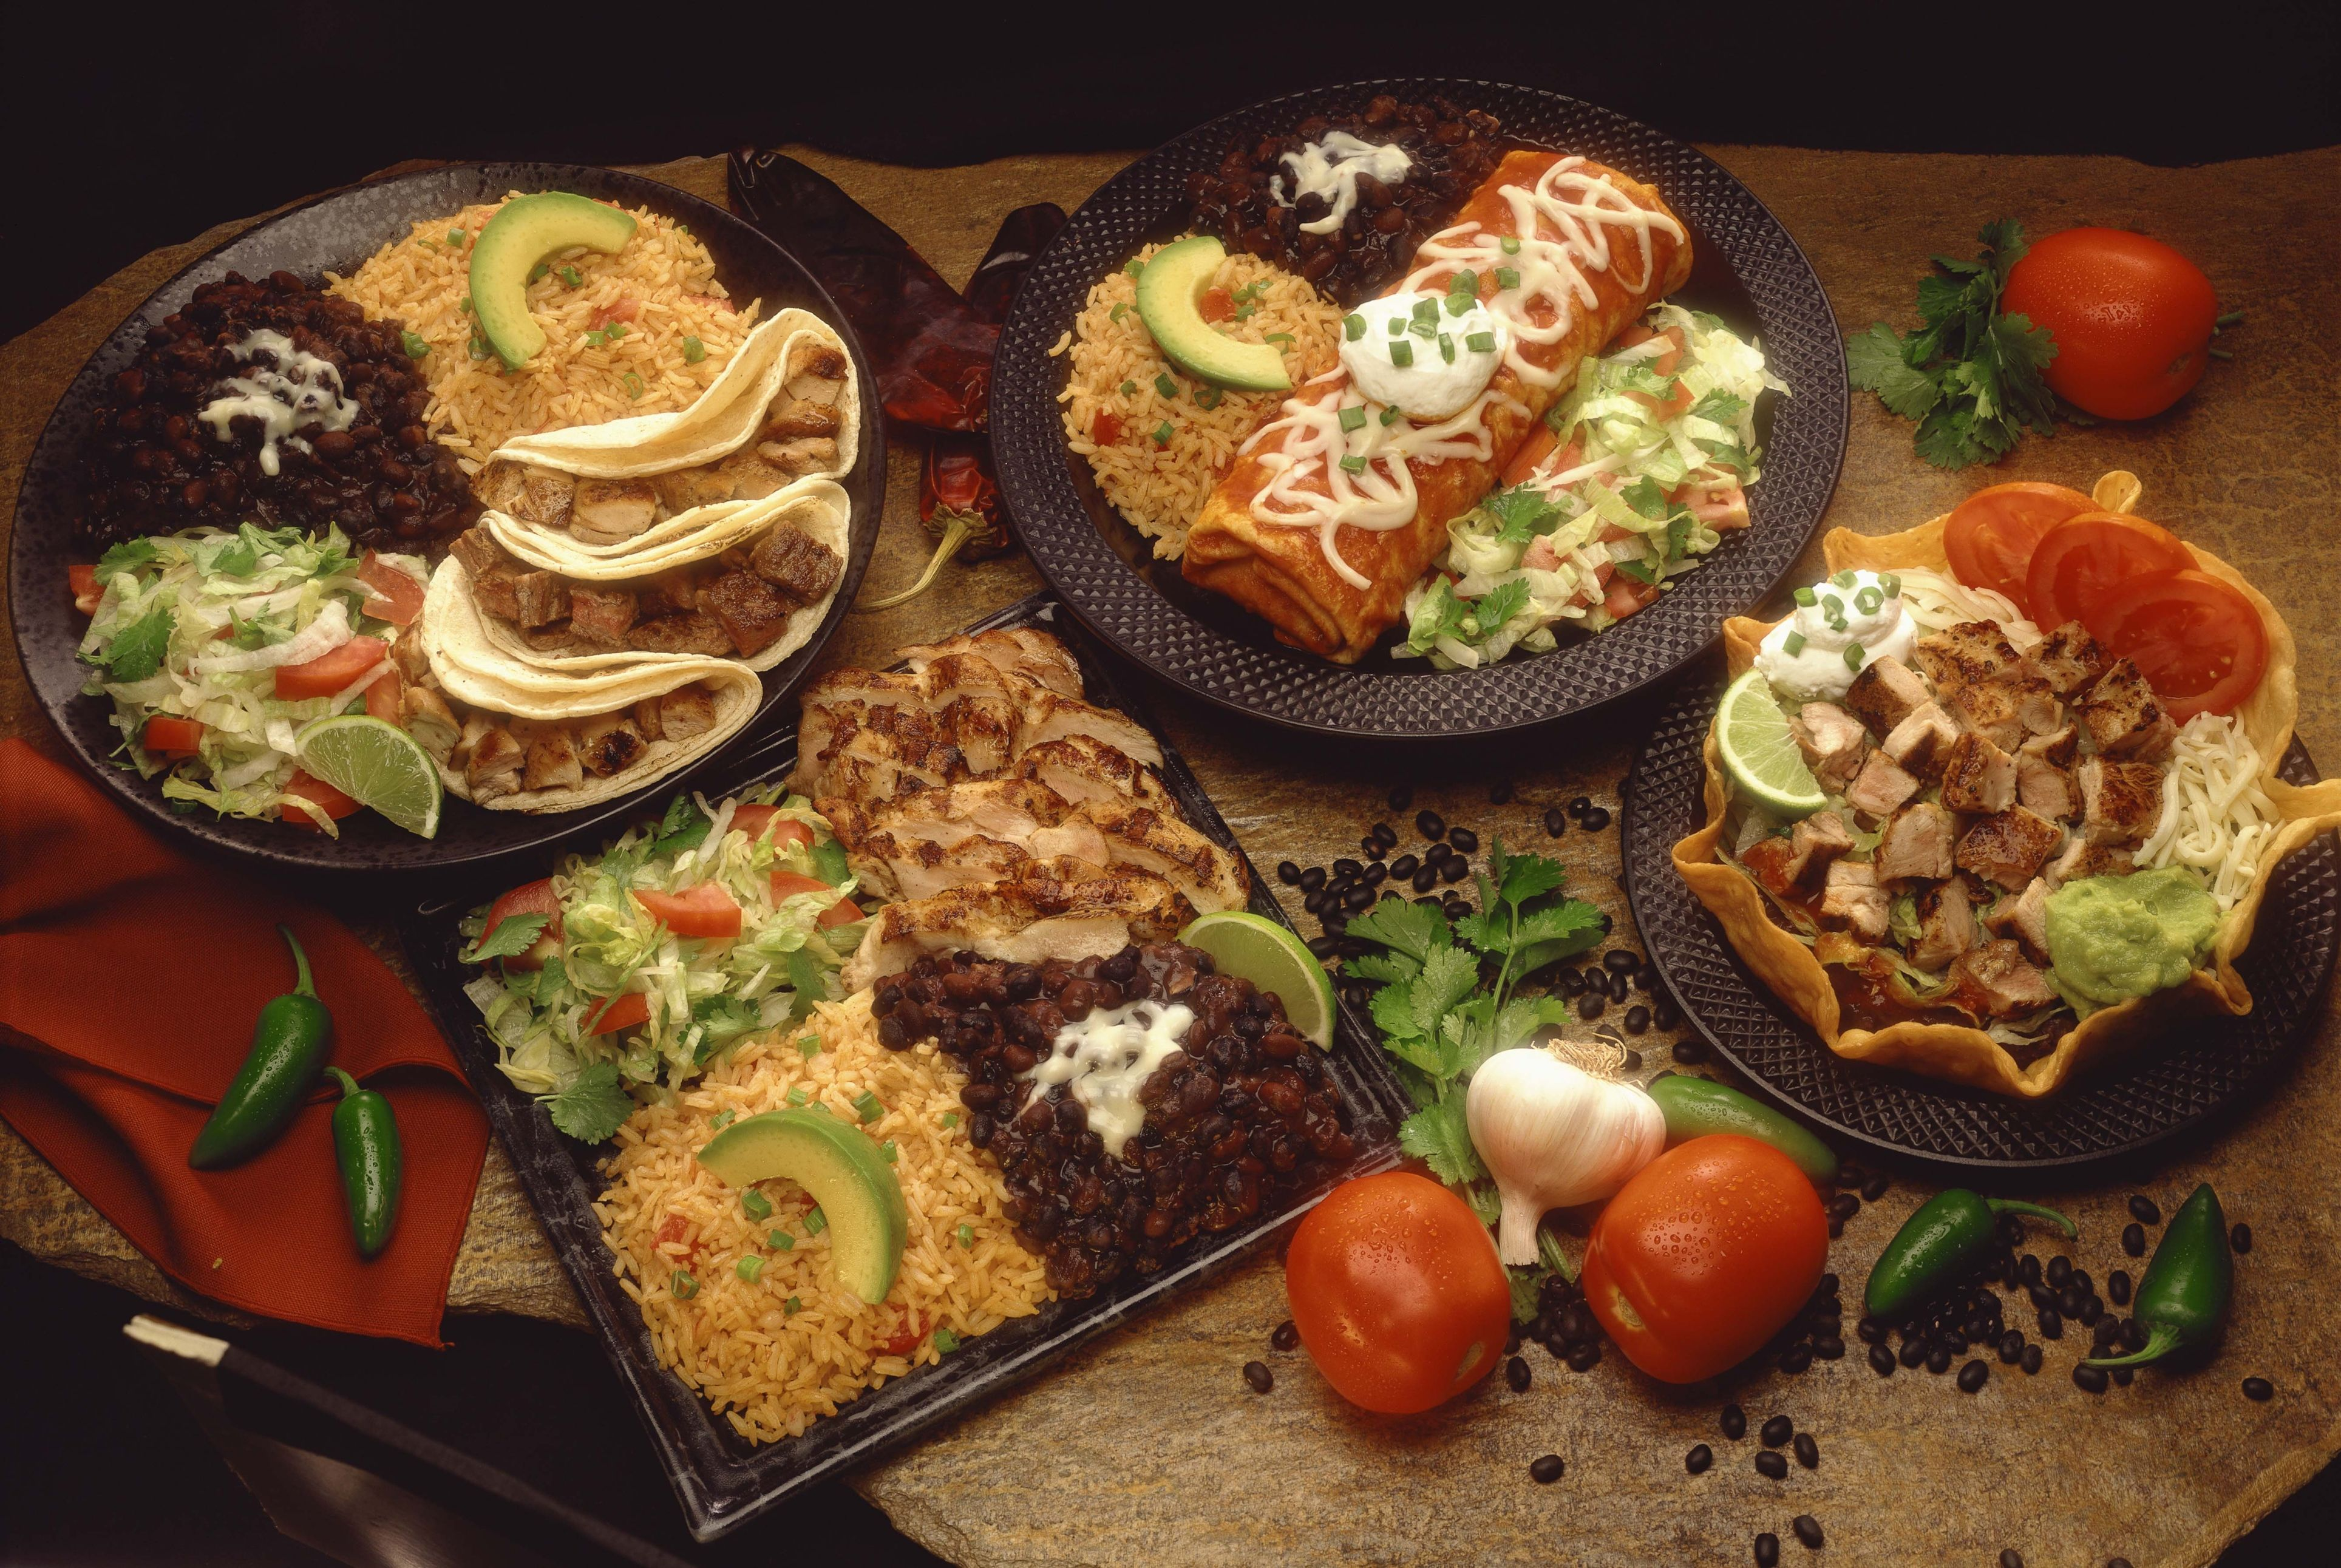 comida mexicana authentic mexican food pinterest